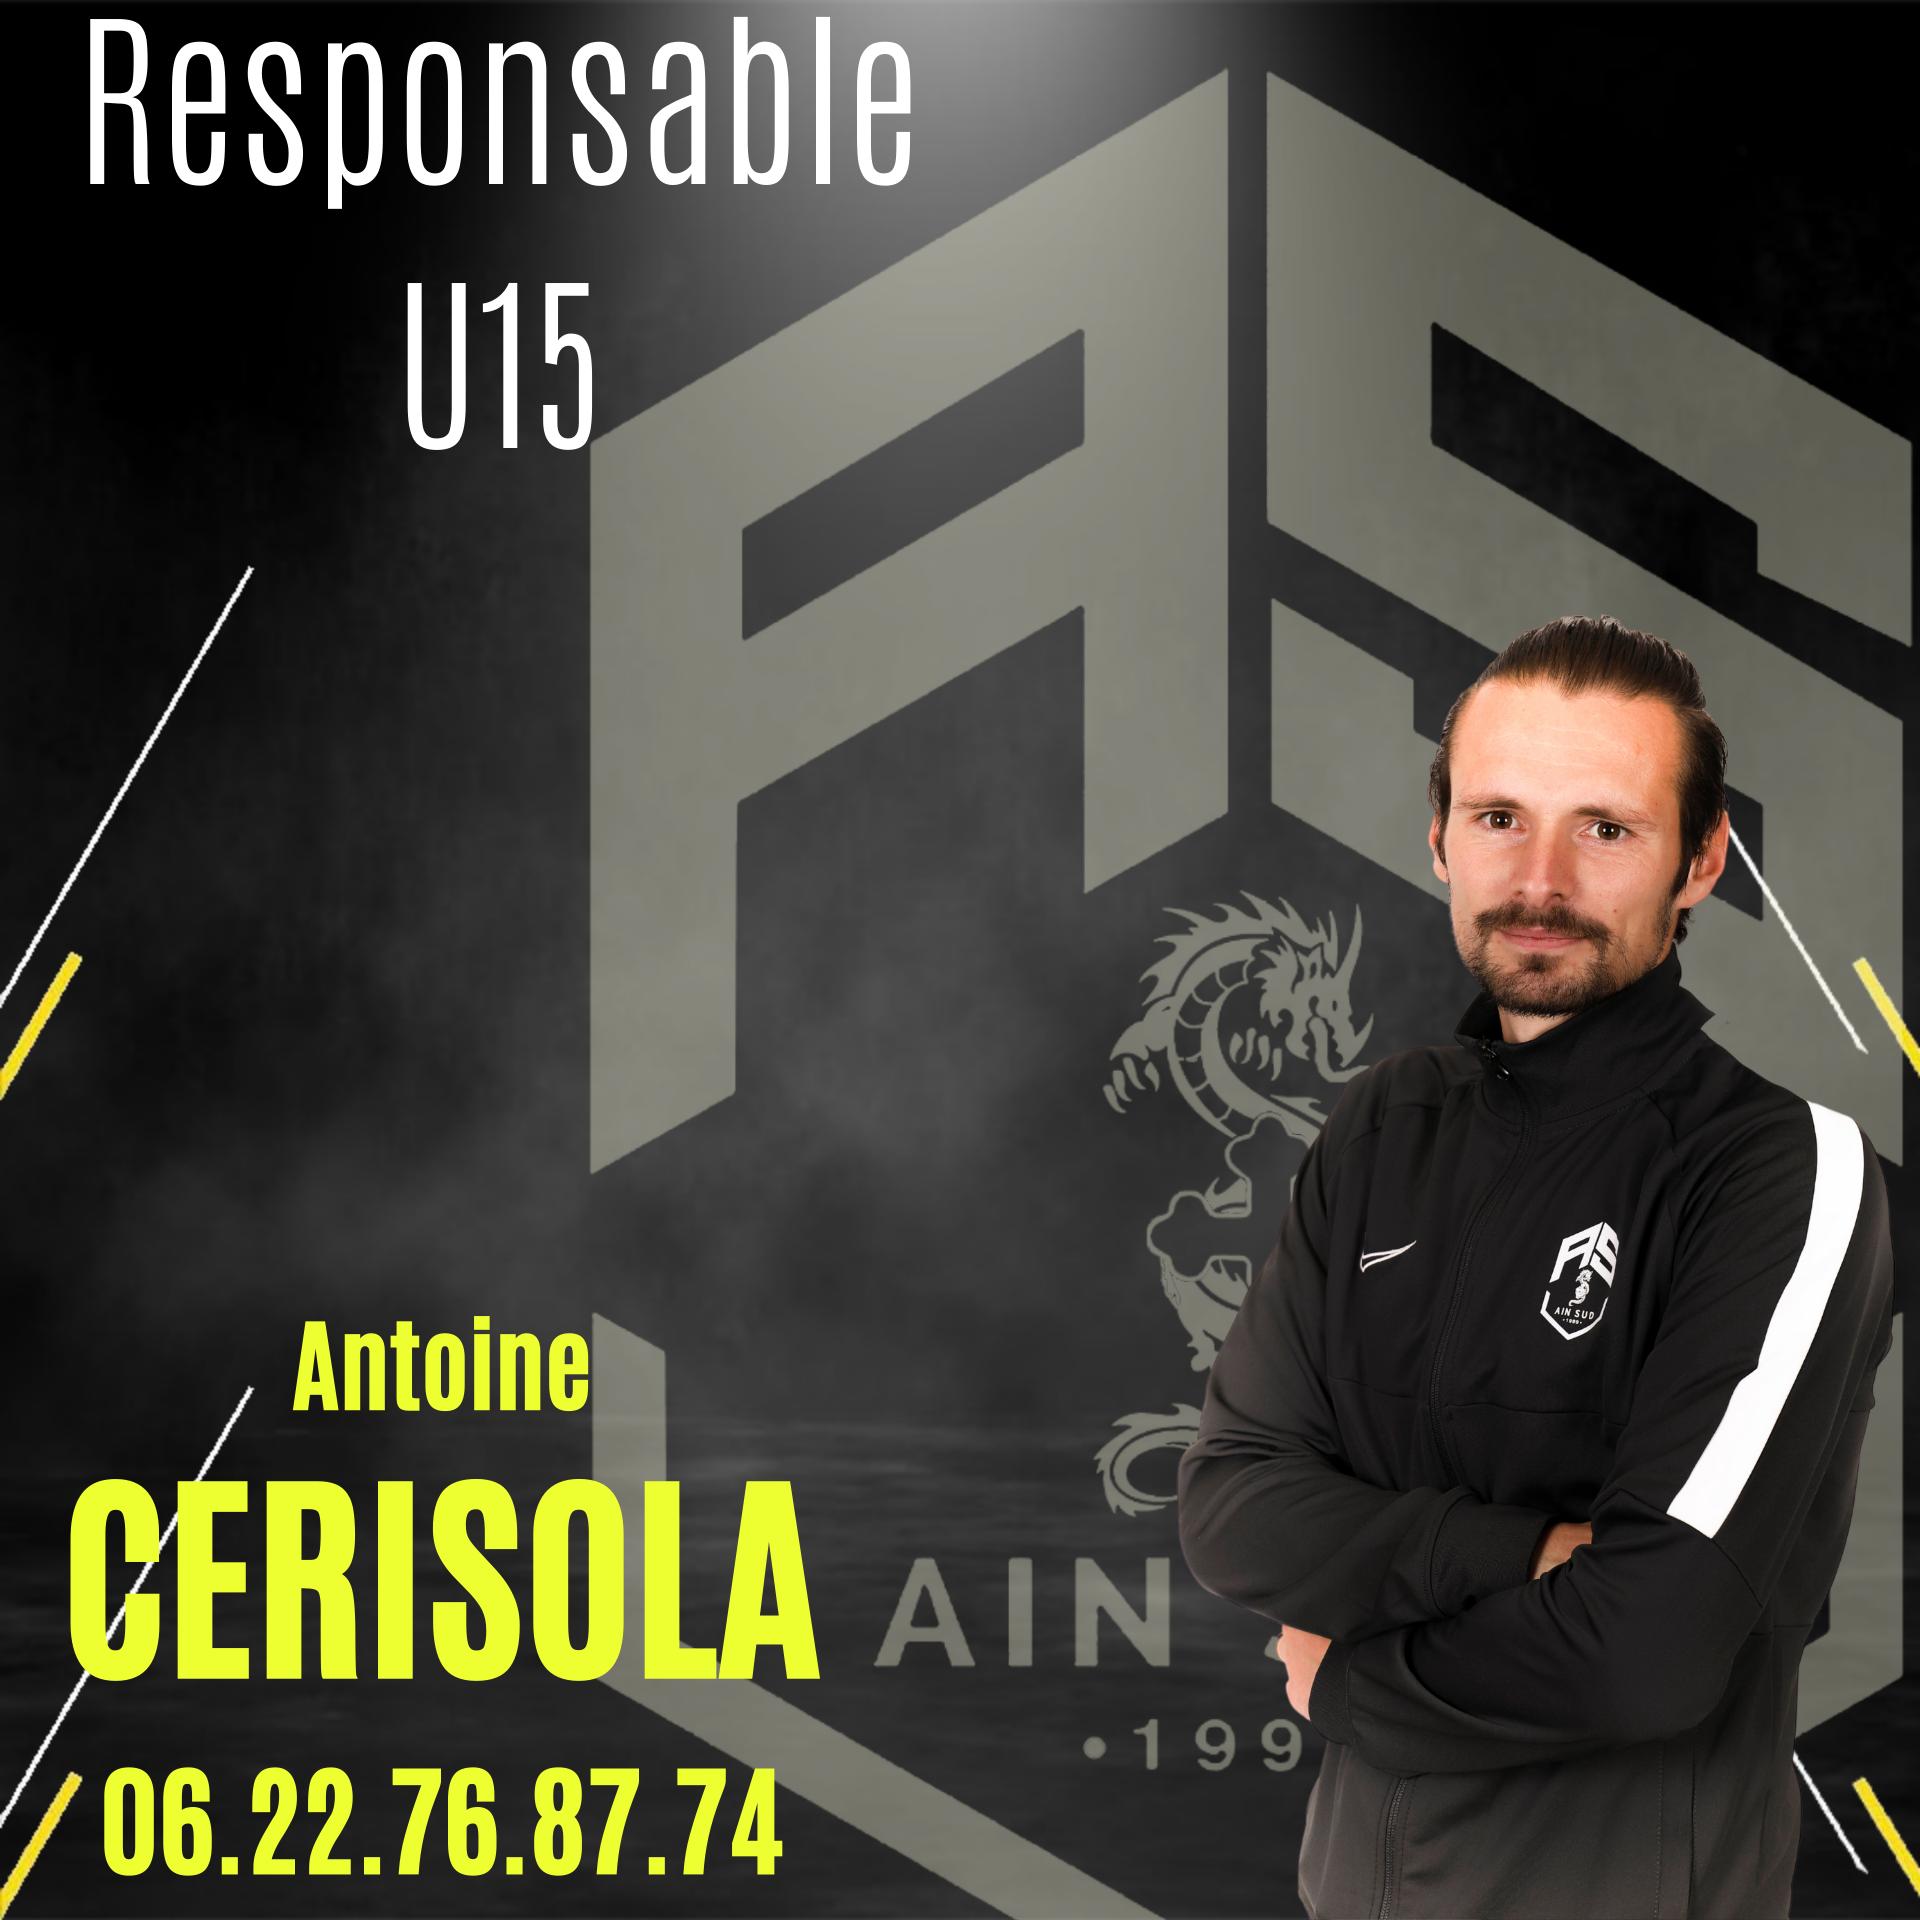 CERISOLA.png